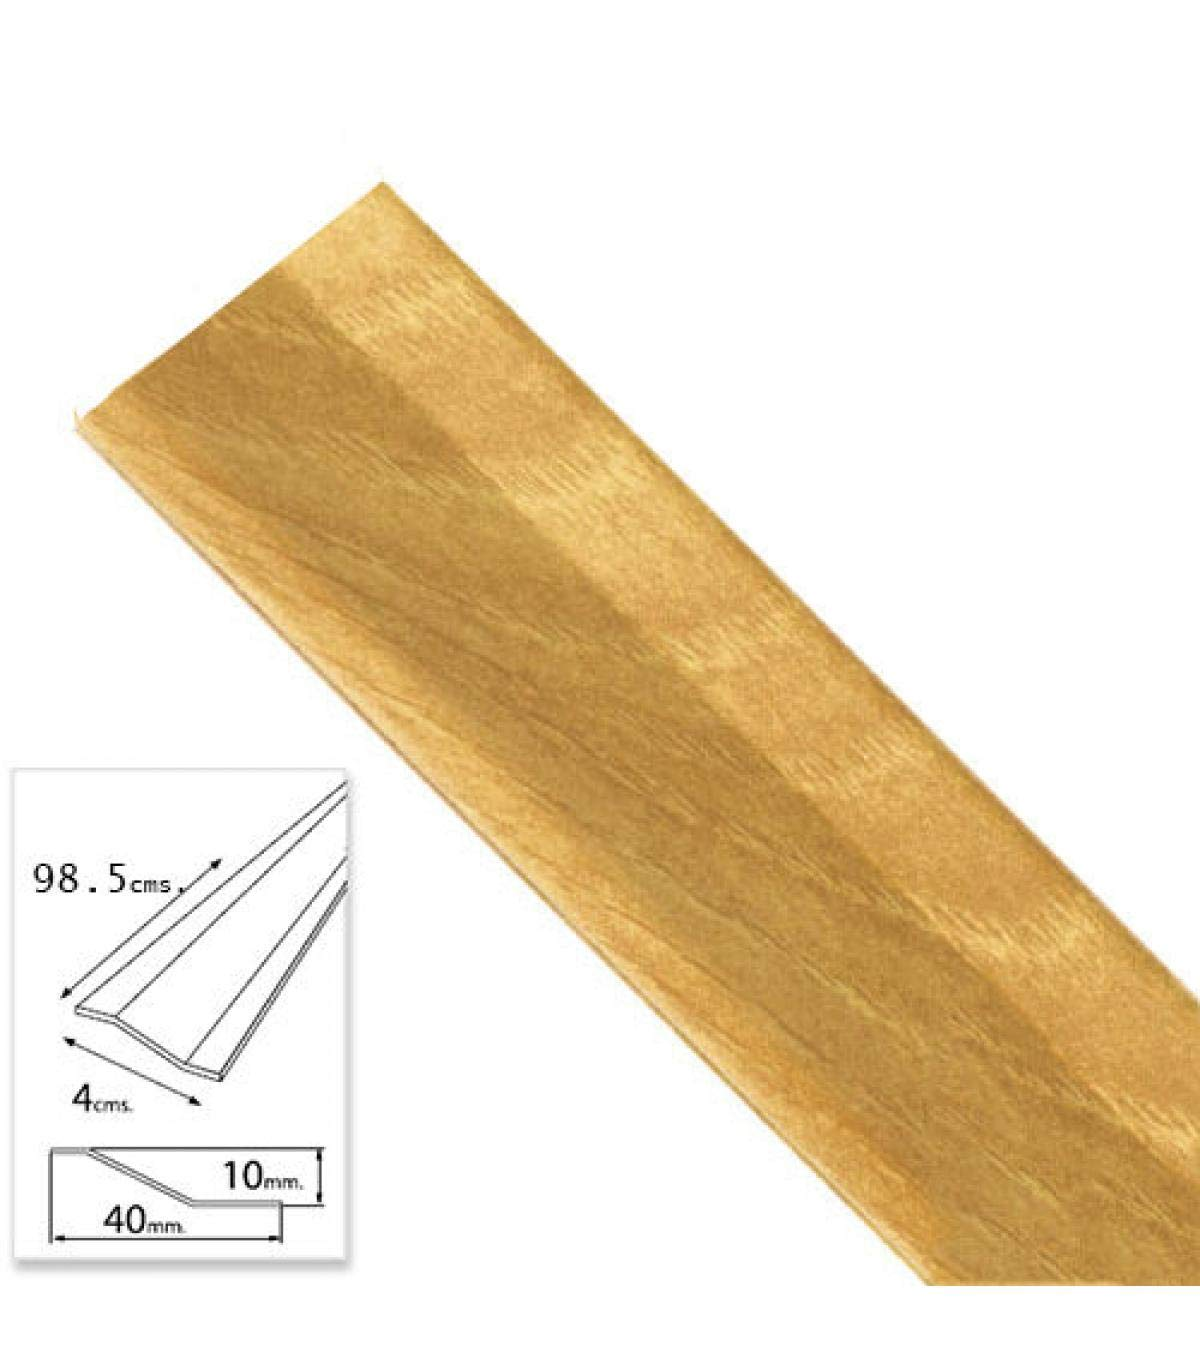 Aluminio, 98,5 cm Color Roble Wolfpack 2541050 Tapajuntas Adhesivo para cer/ámica